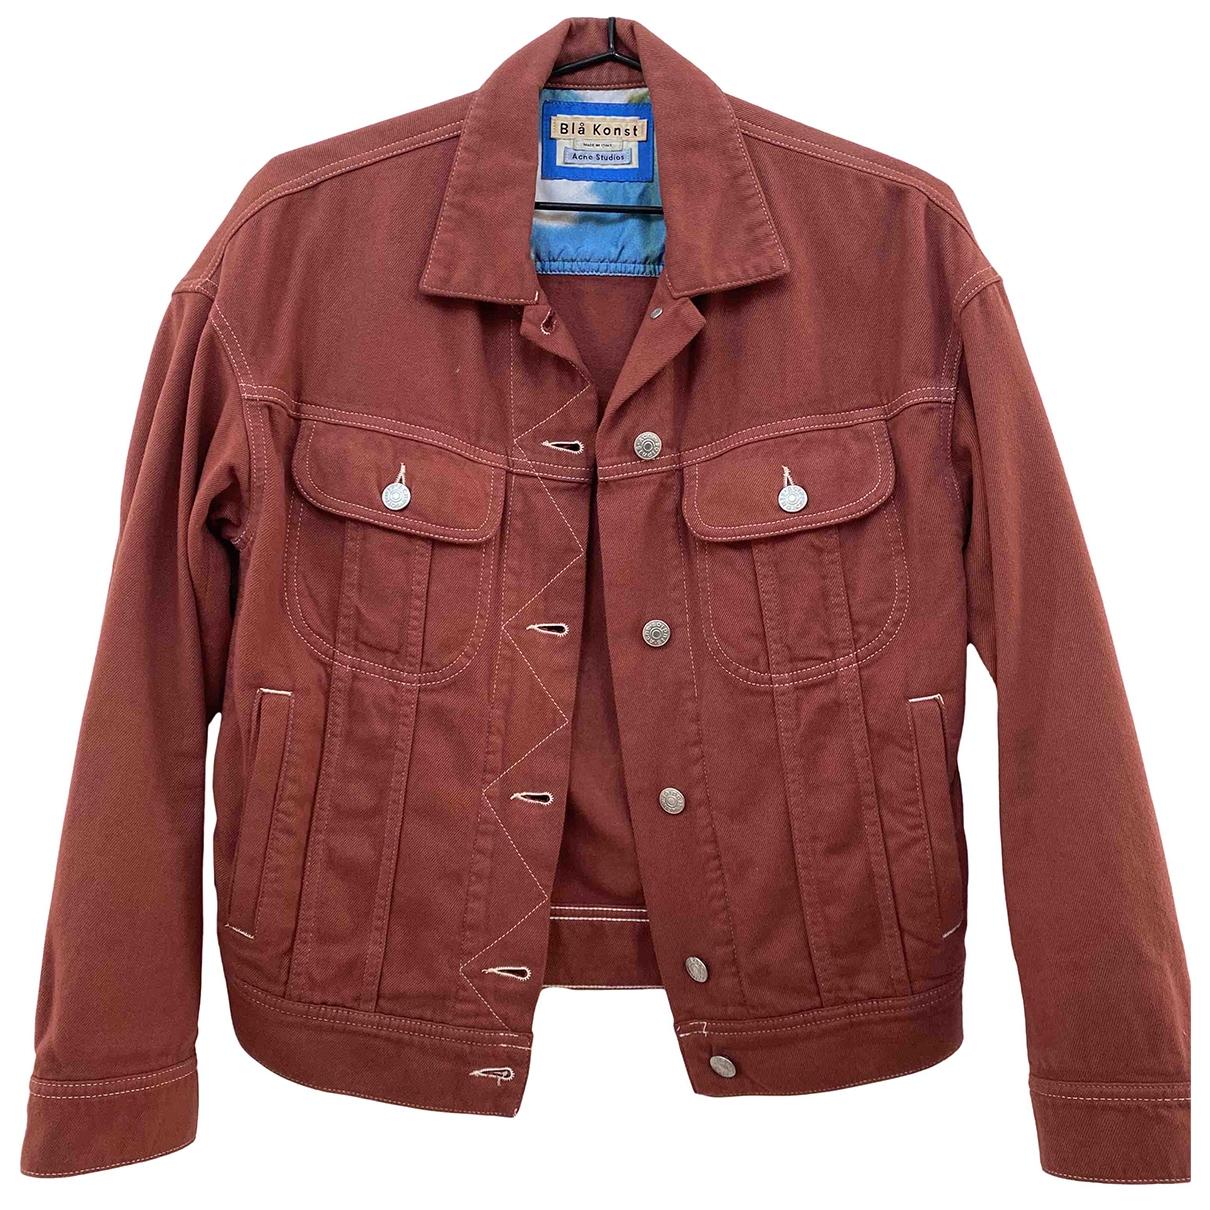 Acne Studios Blå Konst Red Cotton jacket for Women 32 FR